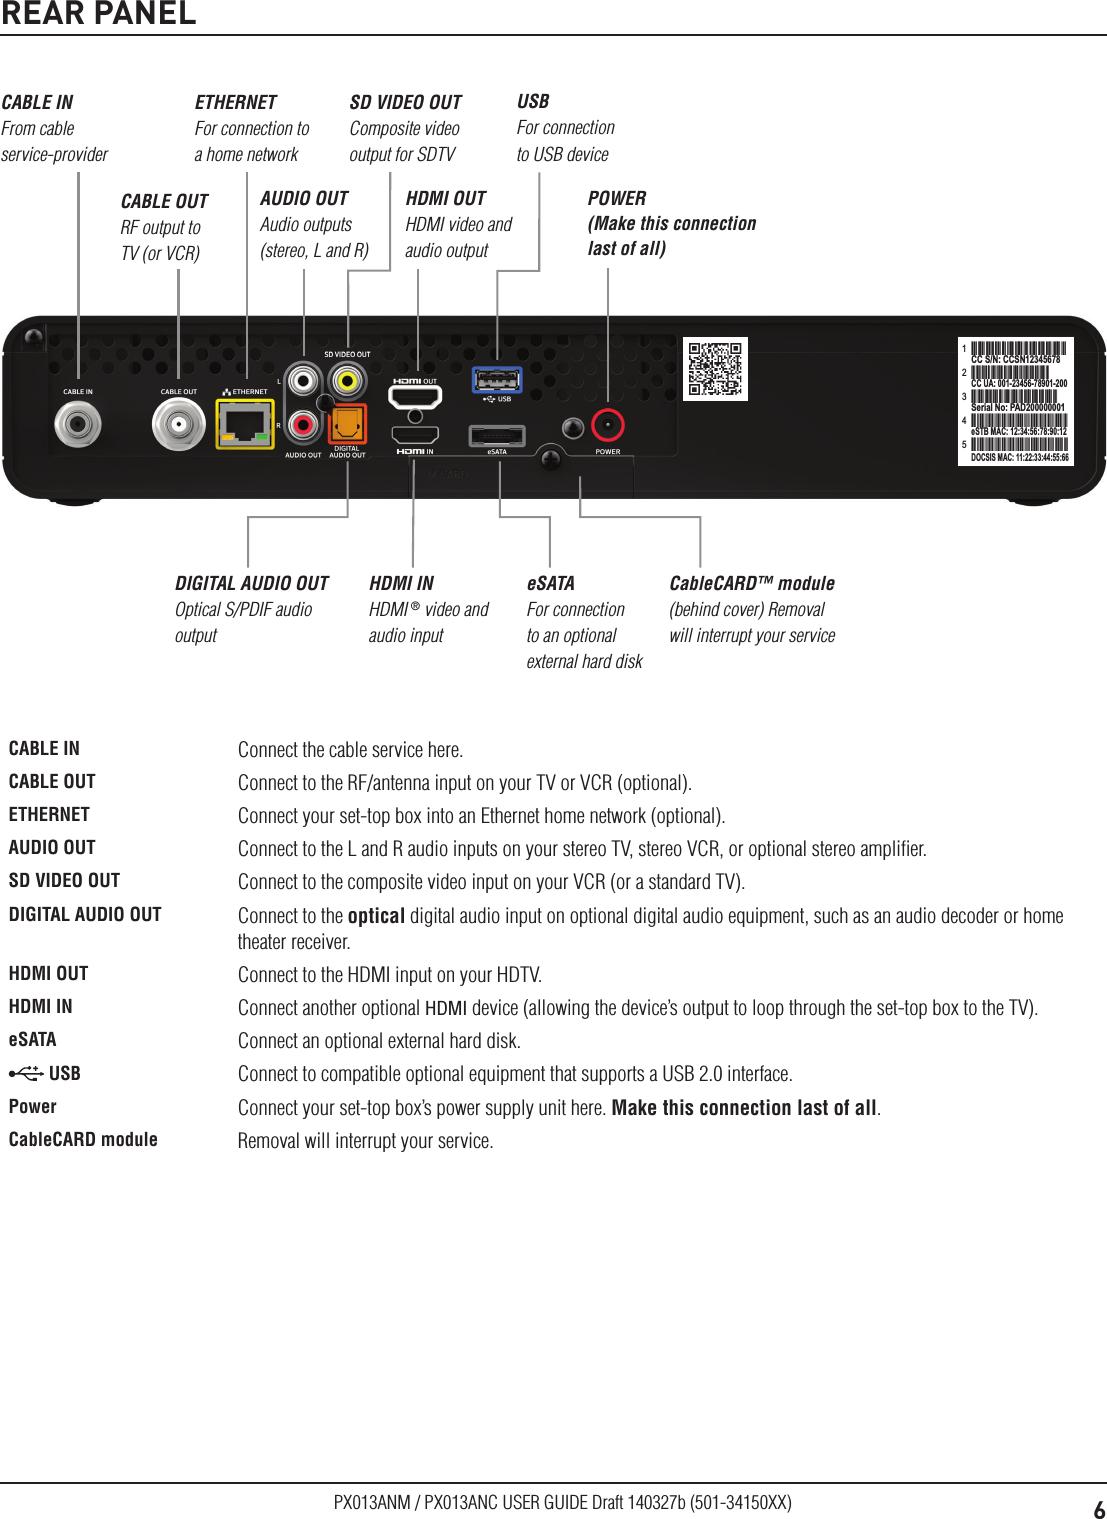 Sterilite Set Of 2 11 4 L Boxes Manual Guide